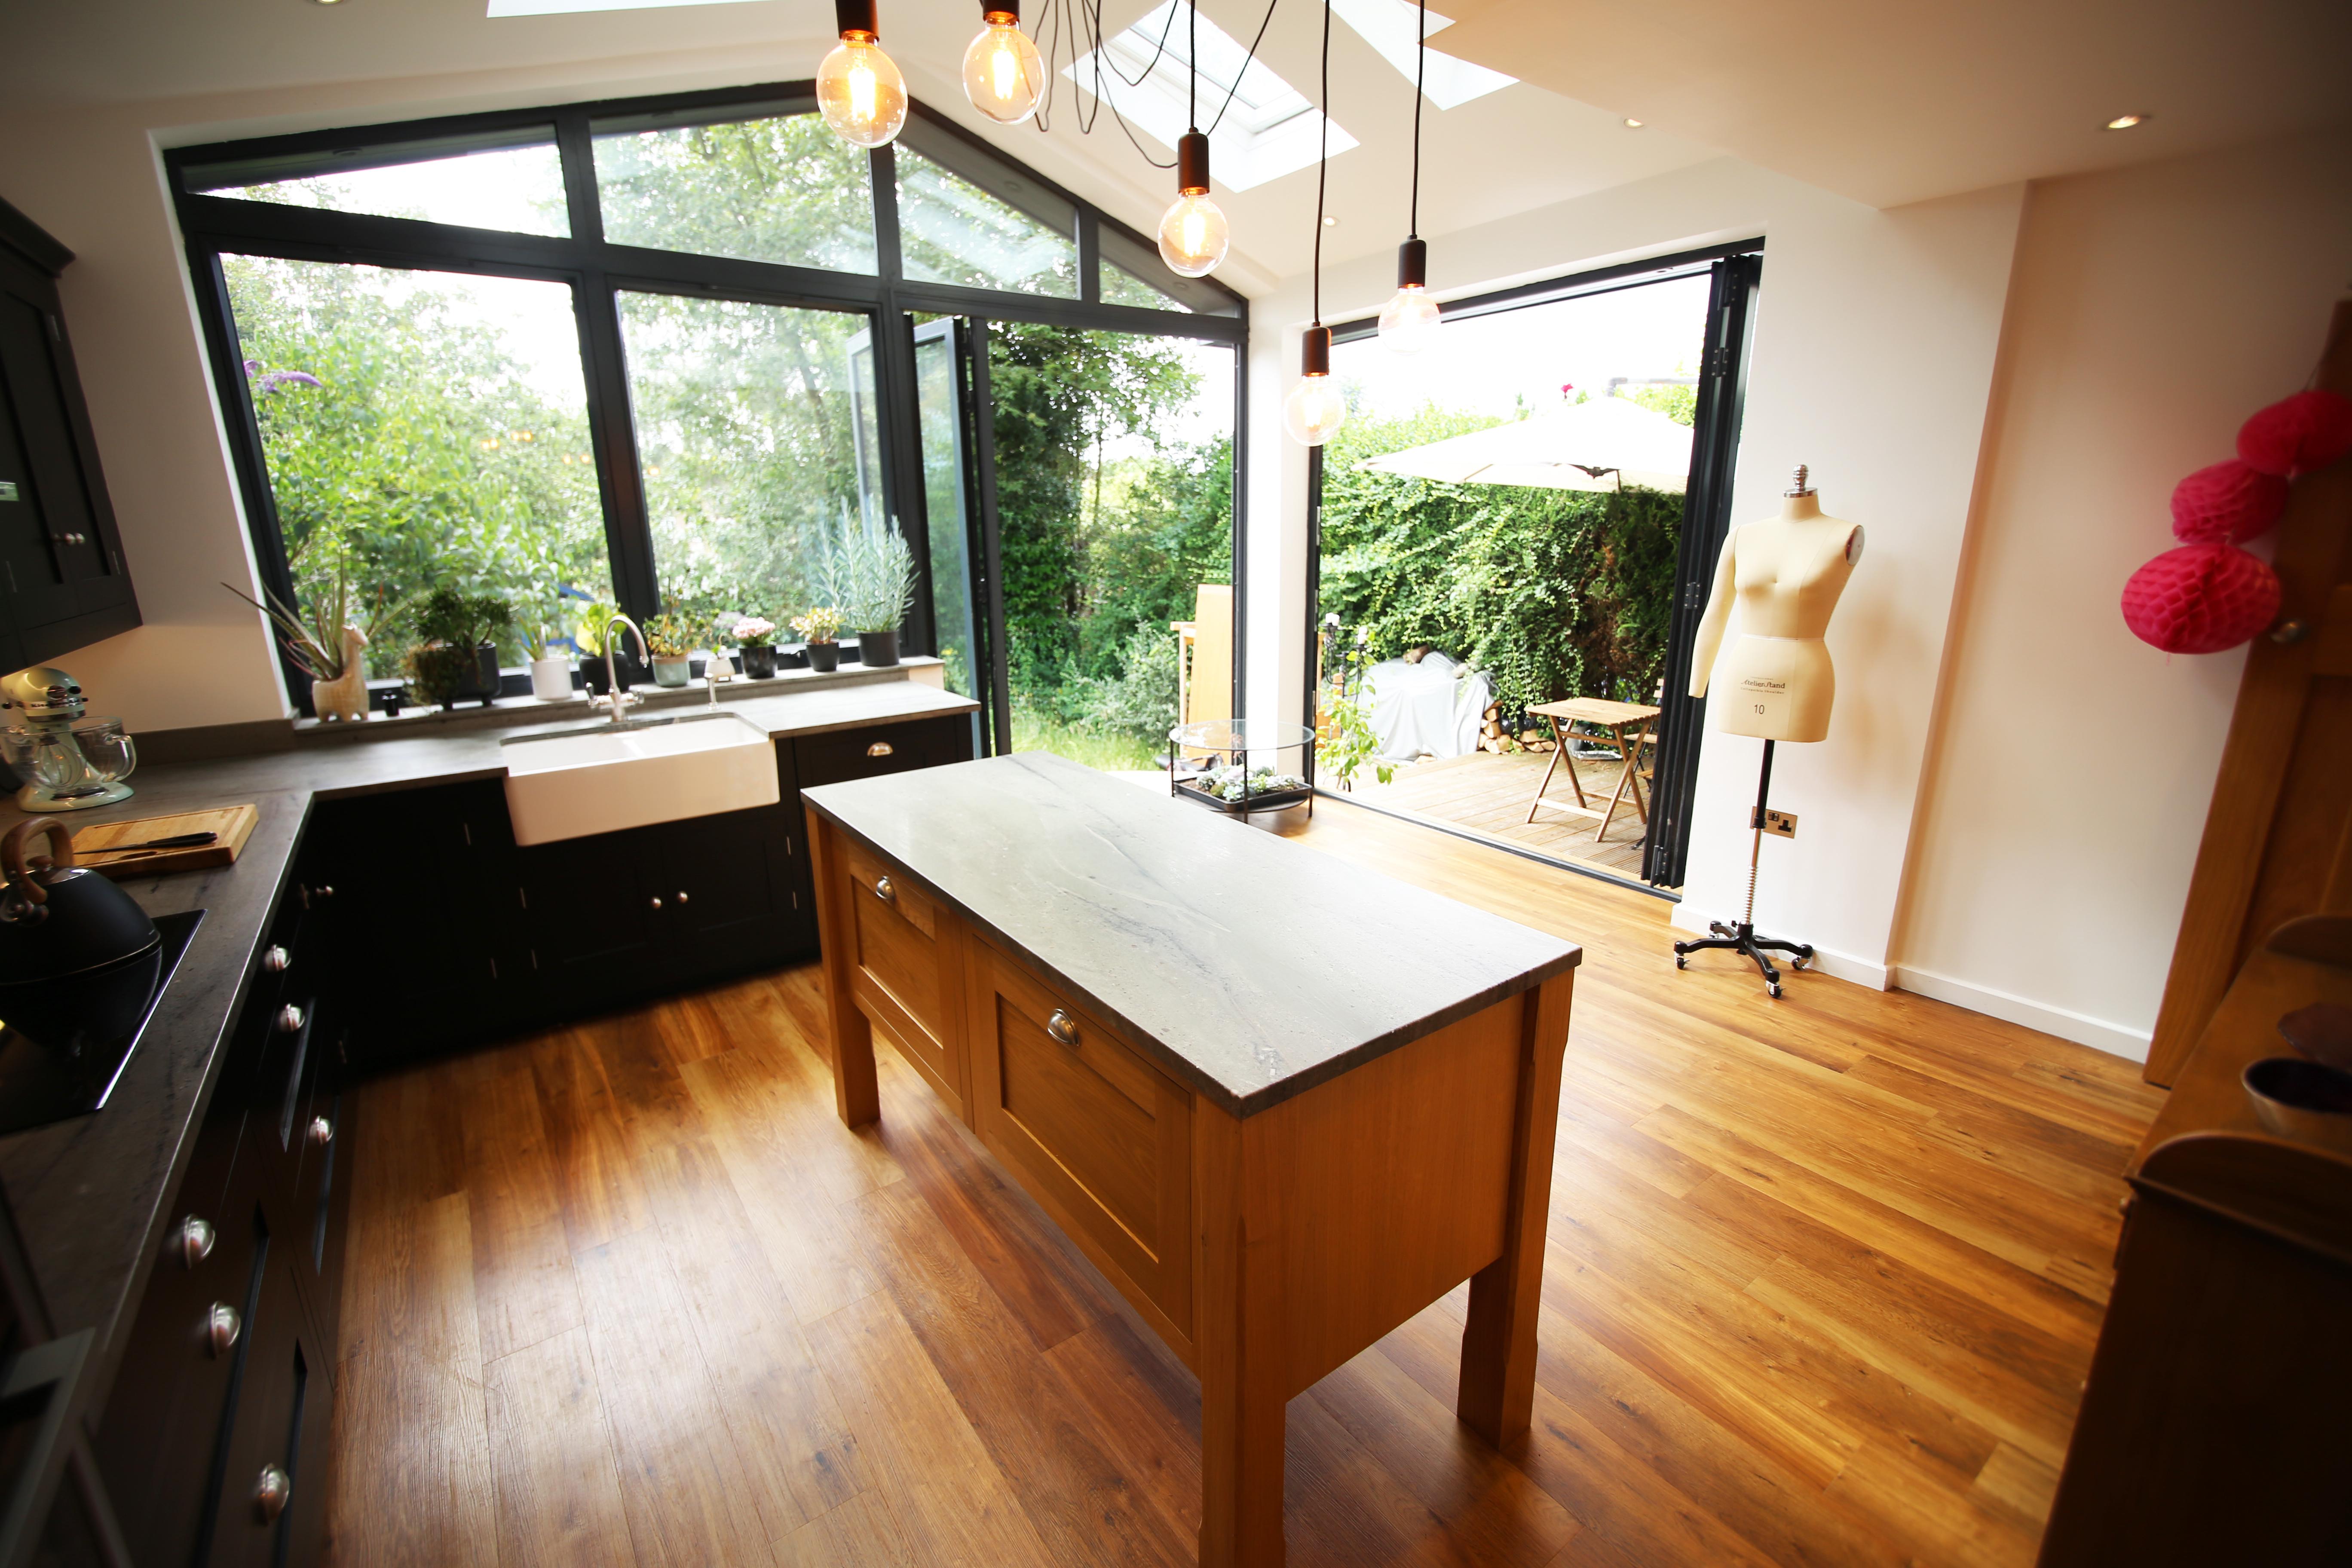 Fluent Kitchen Extension Idea